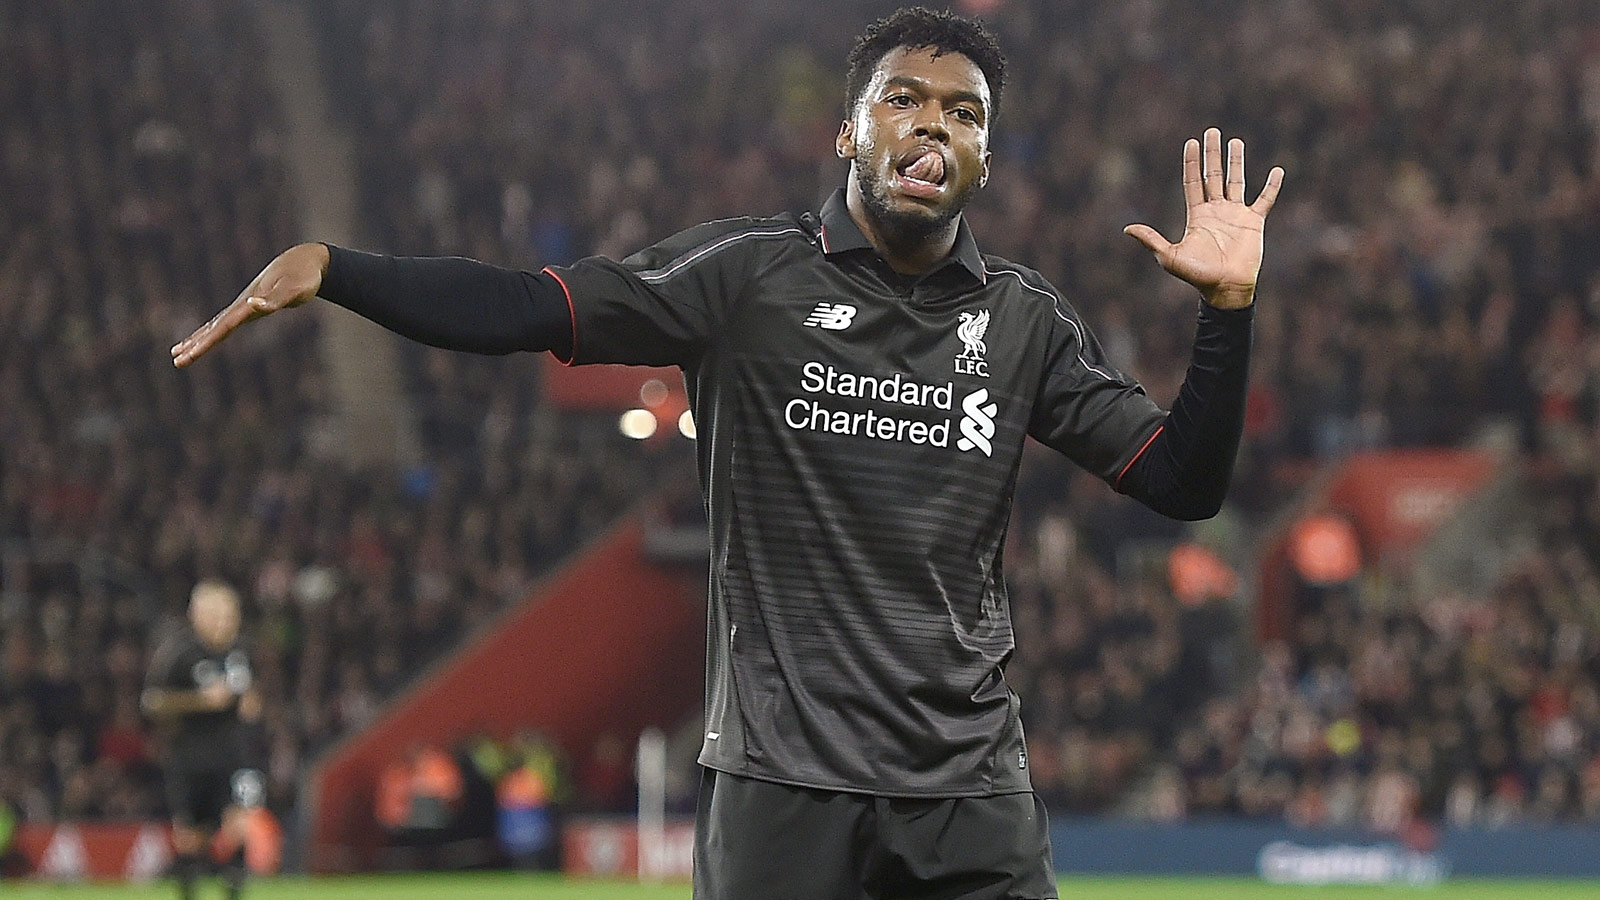 West Ham plan $25.5 million swoop for Liverpool striker Sturridge